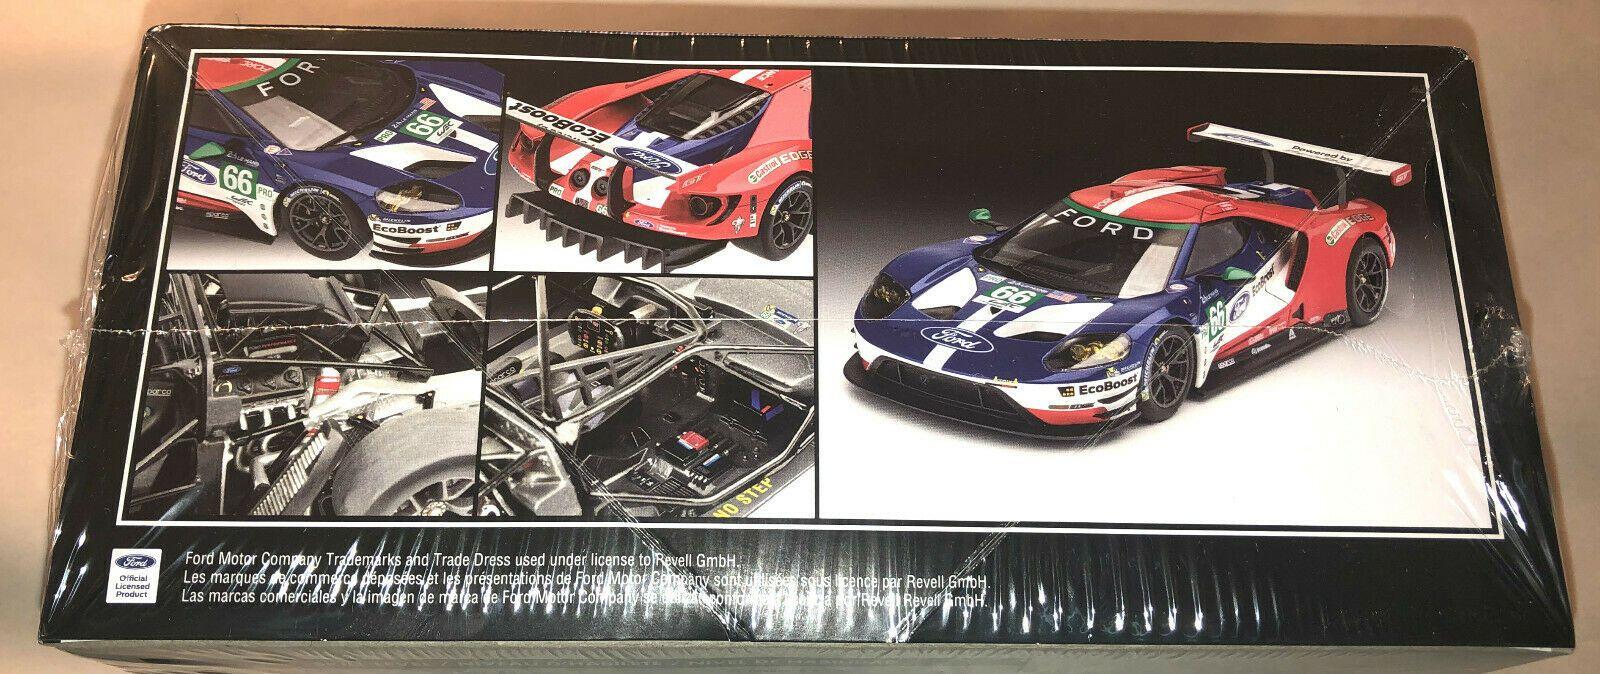 Revell Ford Gt Le Mans 2017 1 24 Scale Plastic Model Kit New 4418 Ford Gt Plastic Model Kits Ford Gt Le Mans